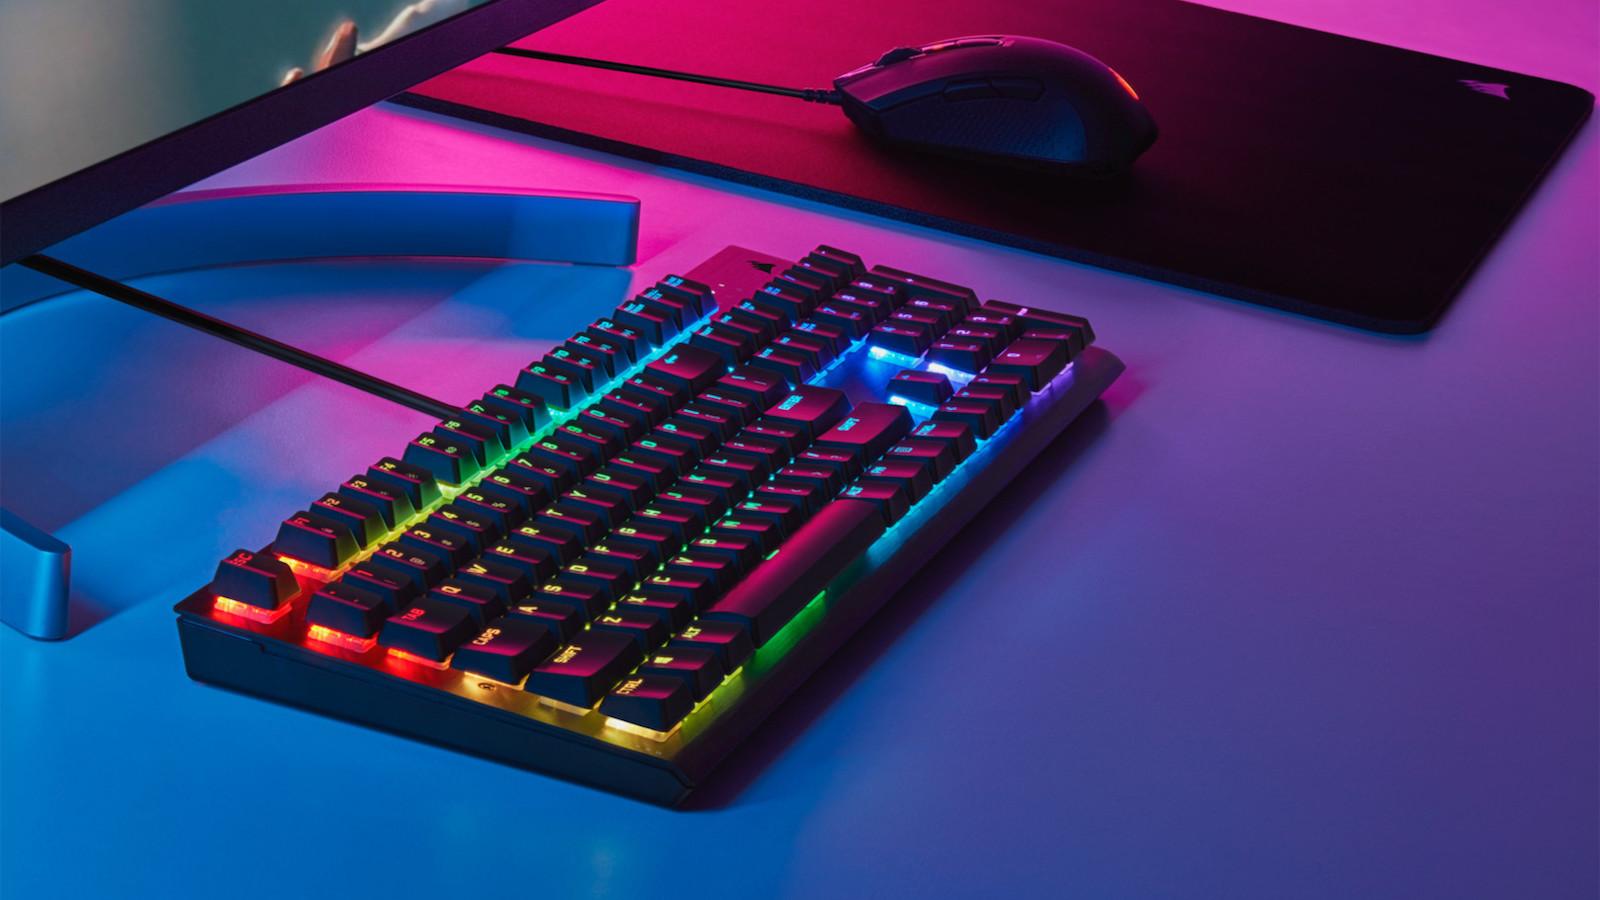 CORSAIR K60 RGB PRO mechanical gaming keyboard possesses a slim and durable design